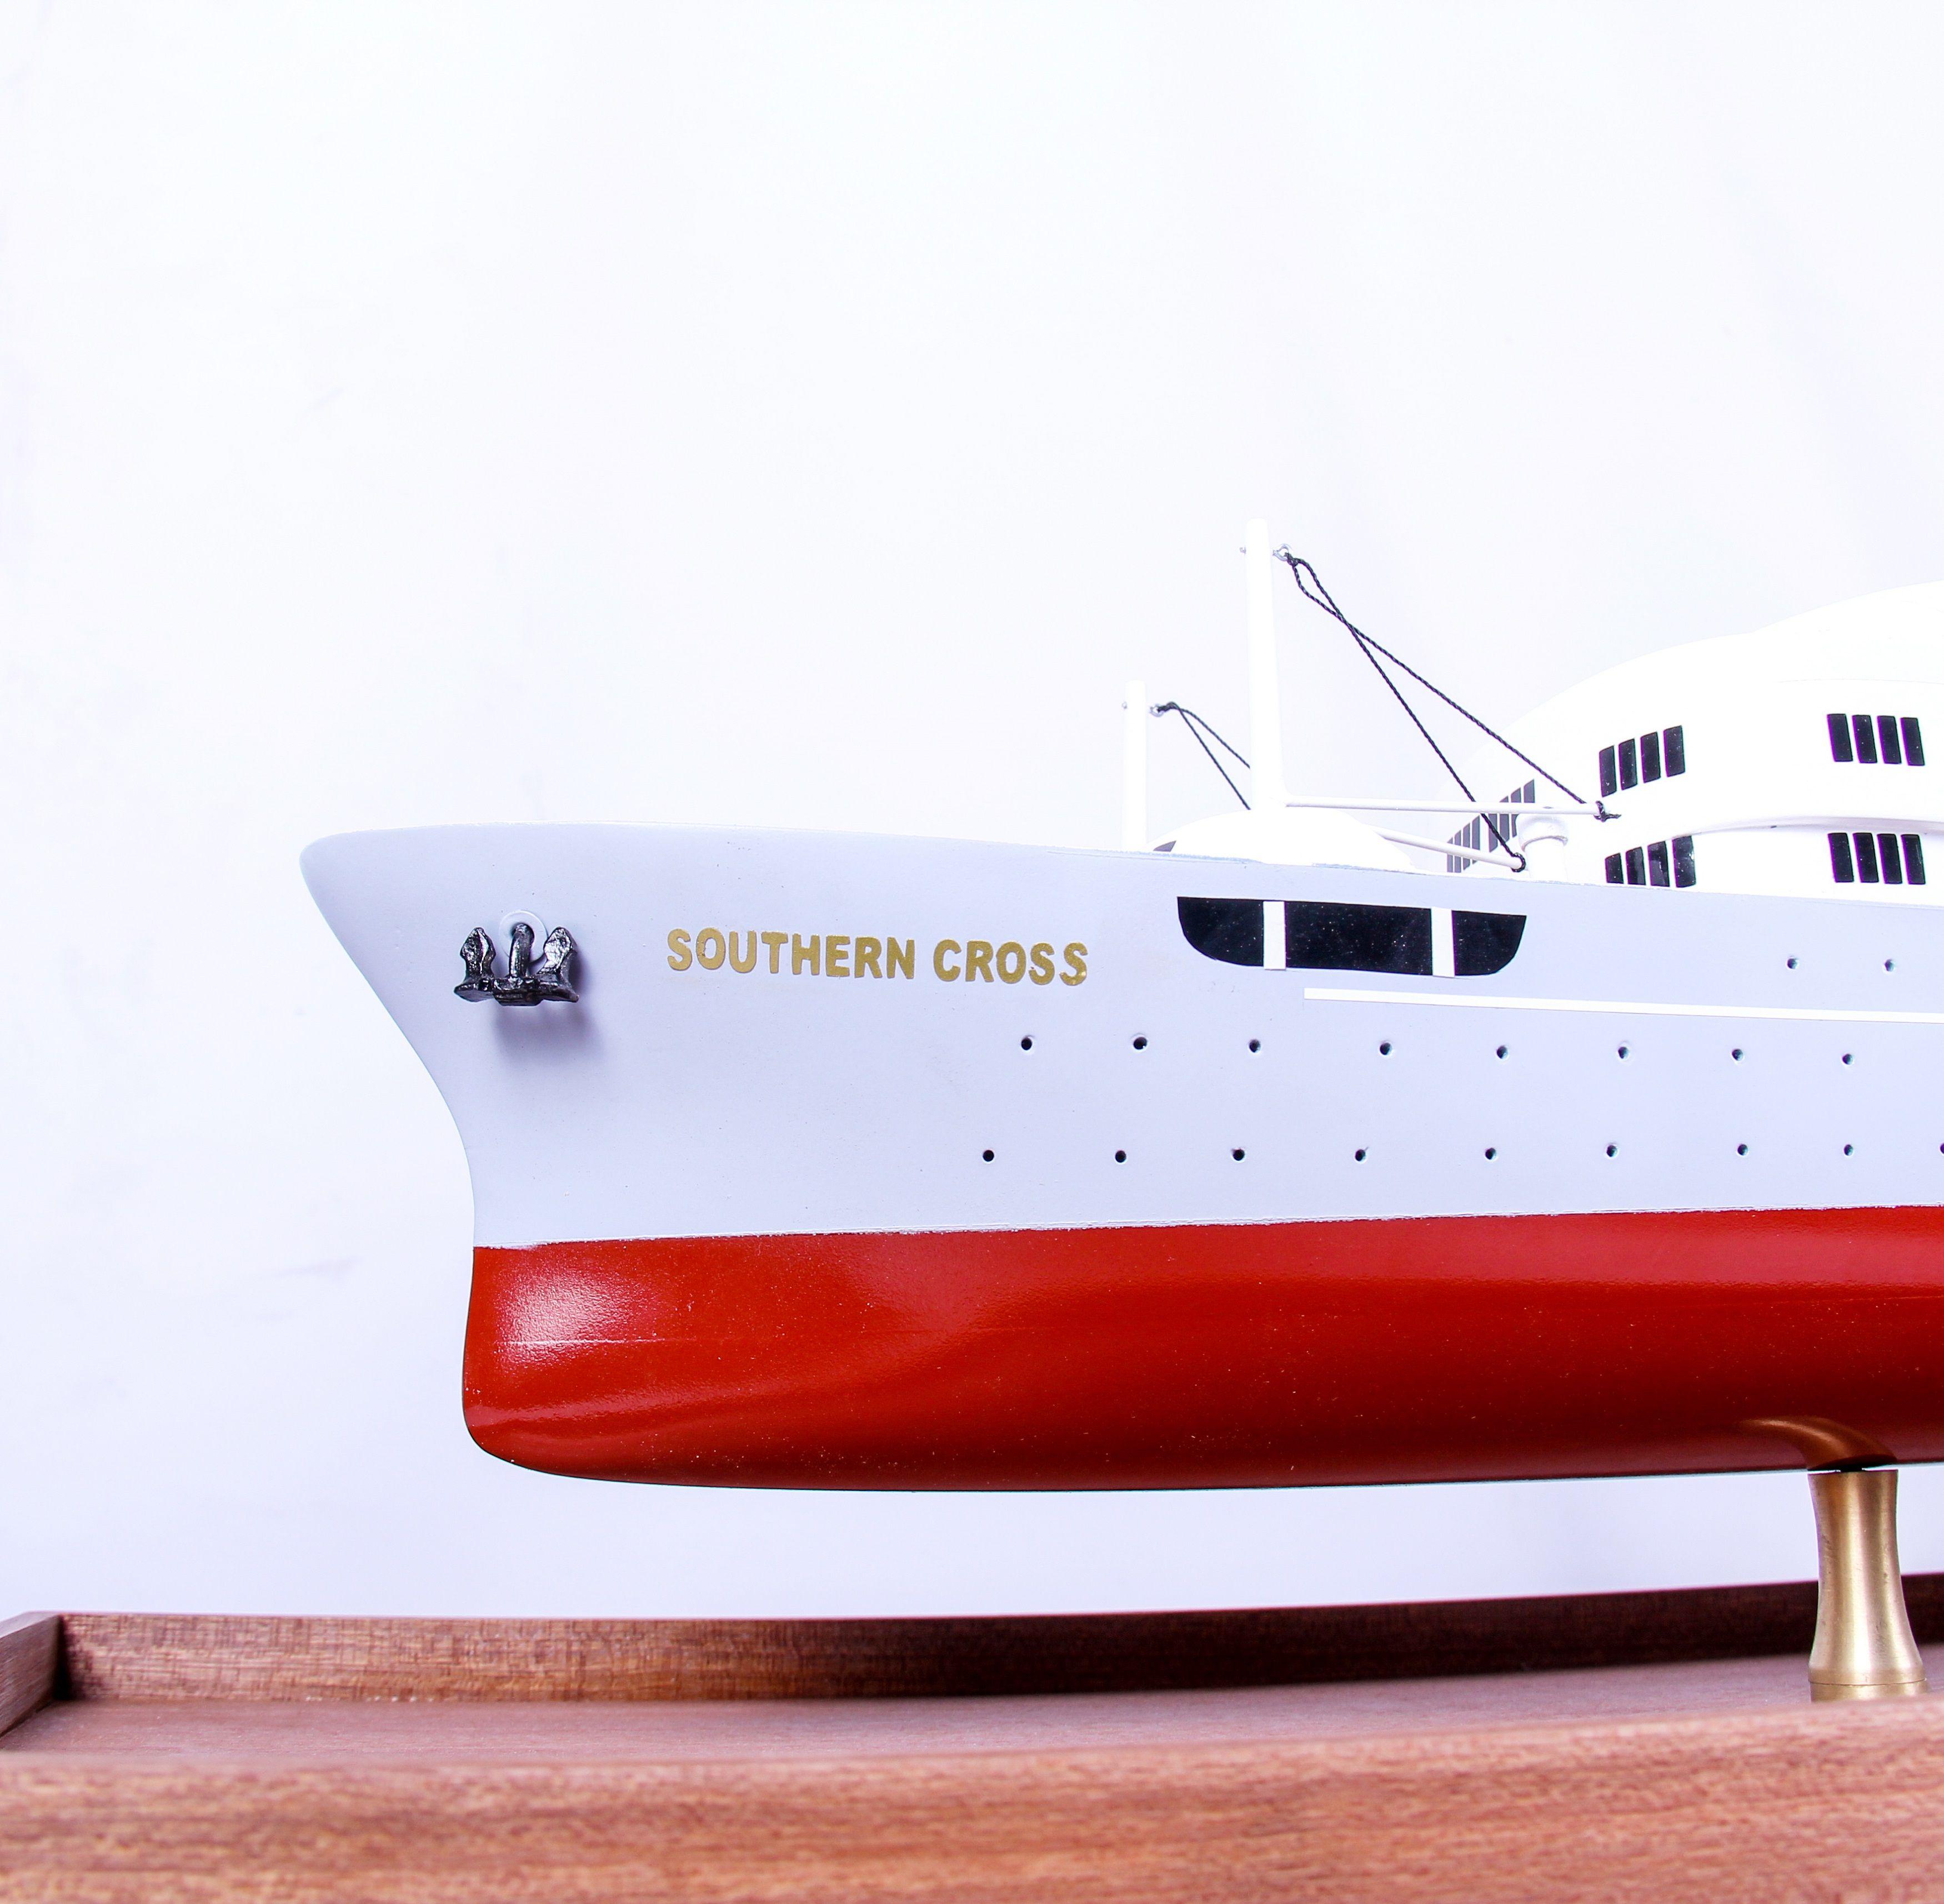 1691-9571-Southern-Cross-Passenger-Liner